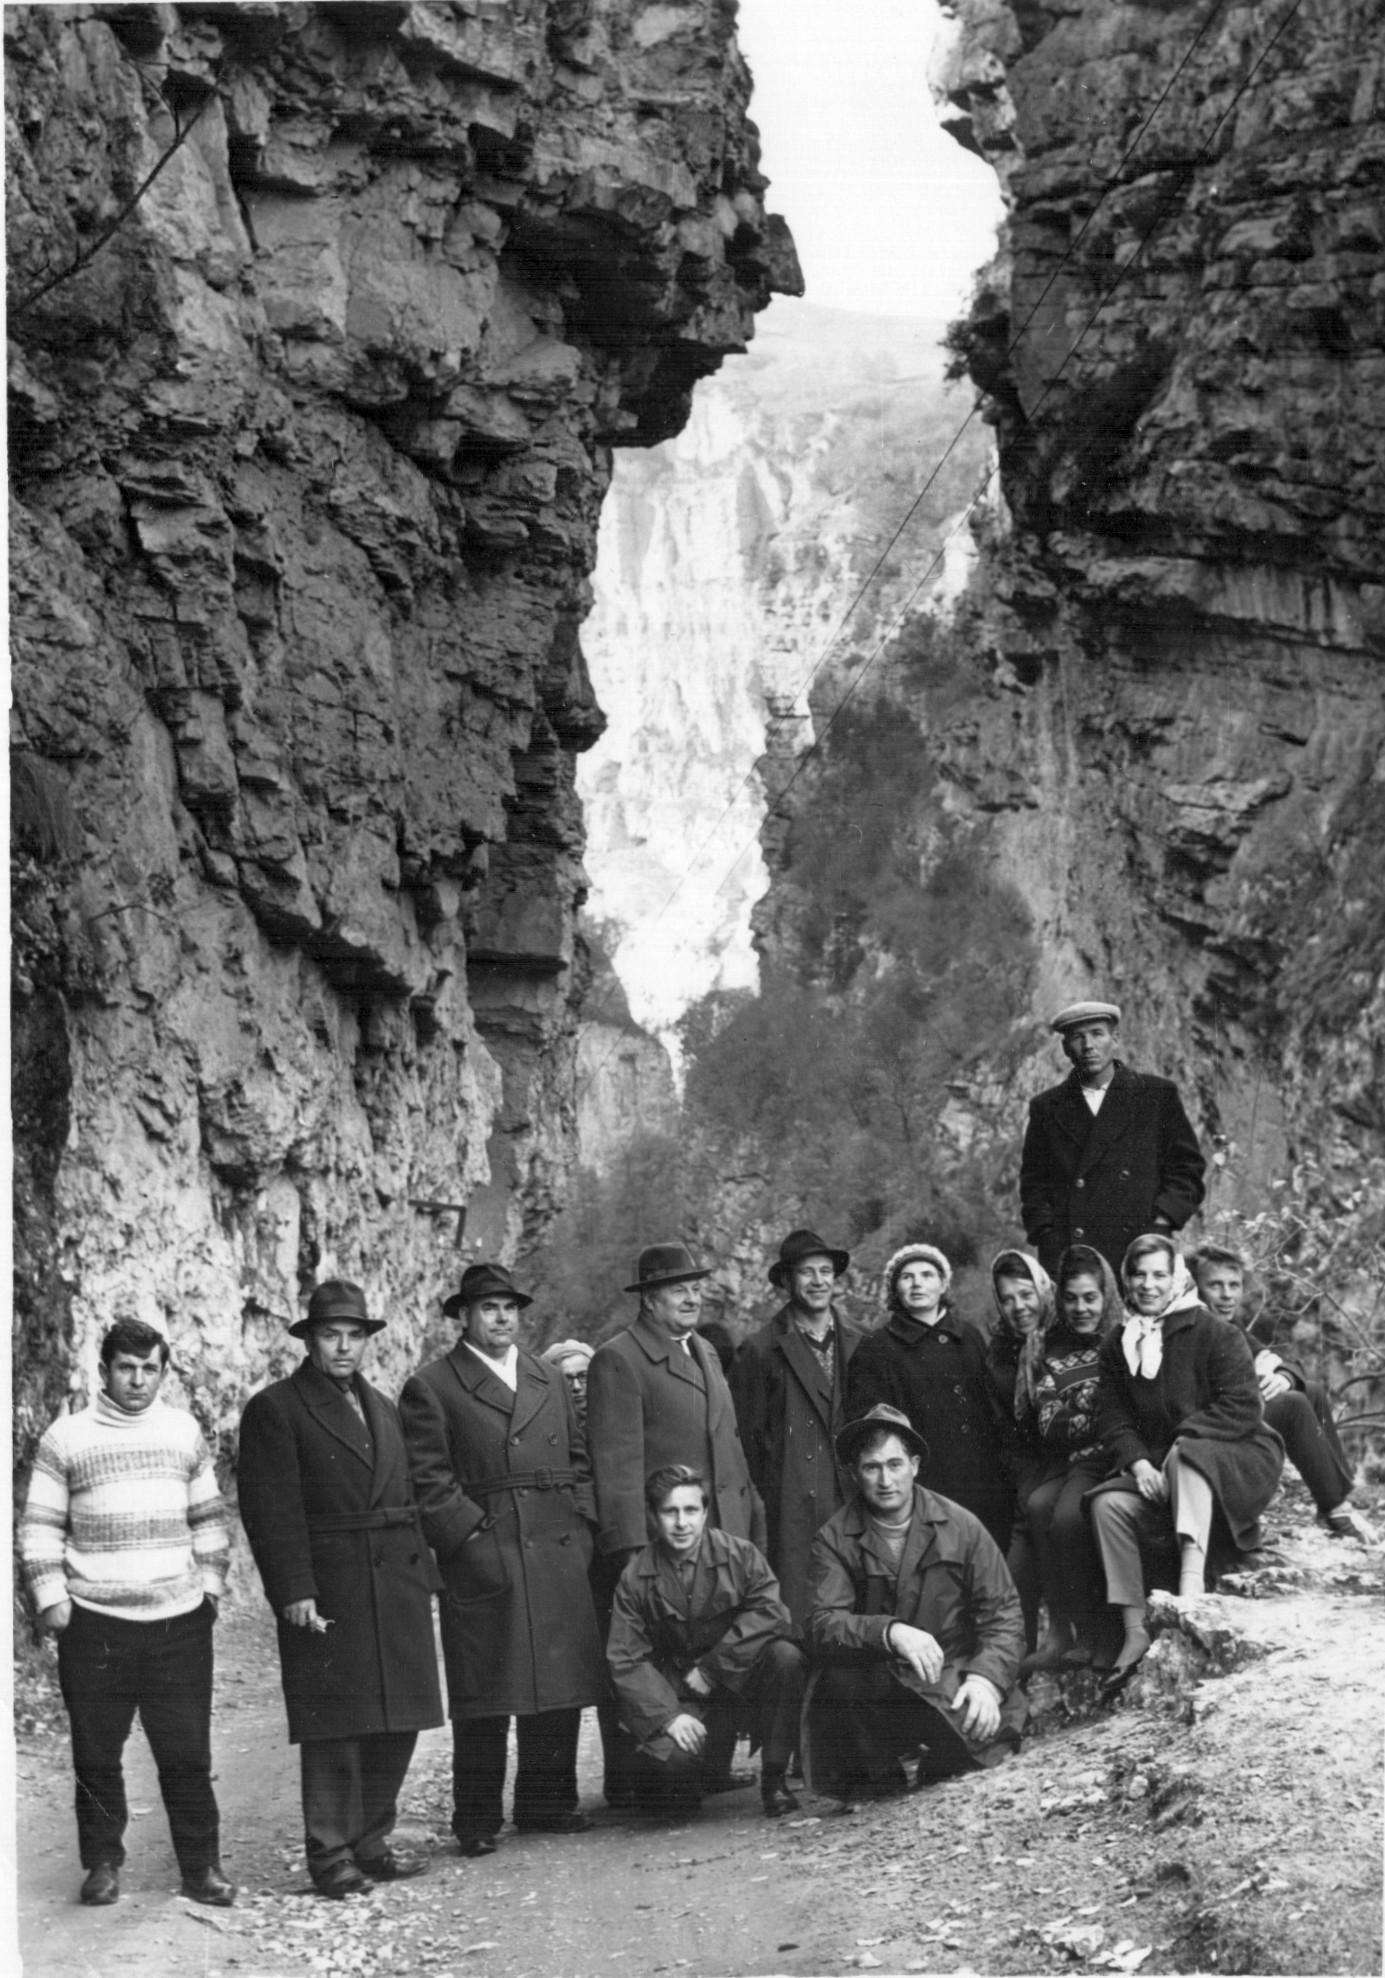 Кавказ. Чегемское ущелье. 1965.